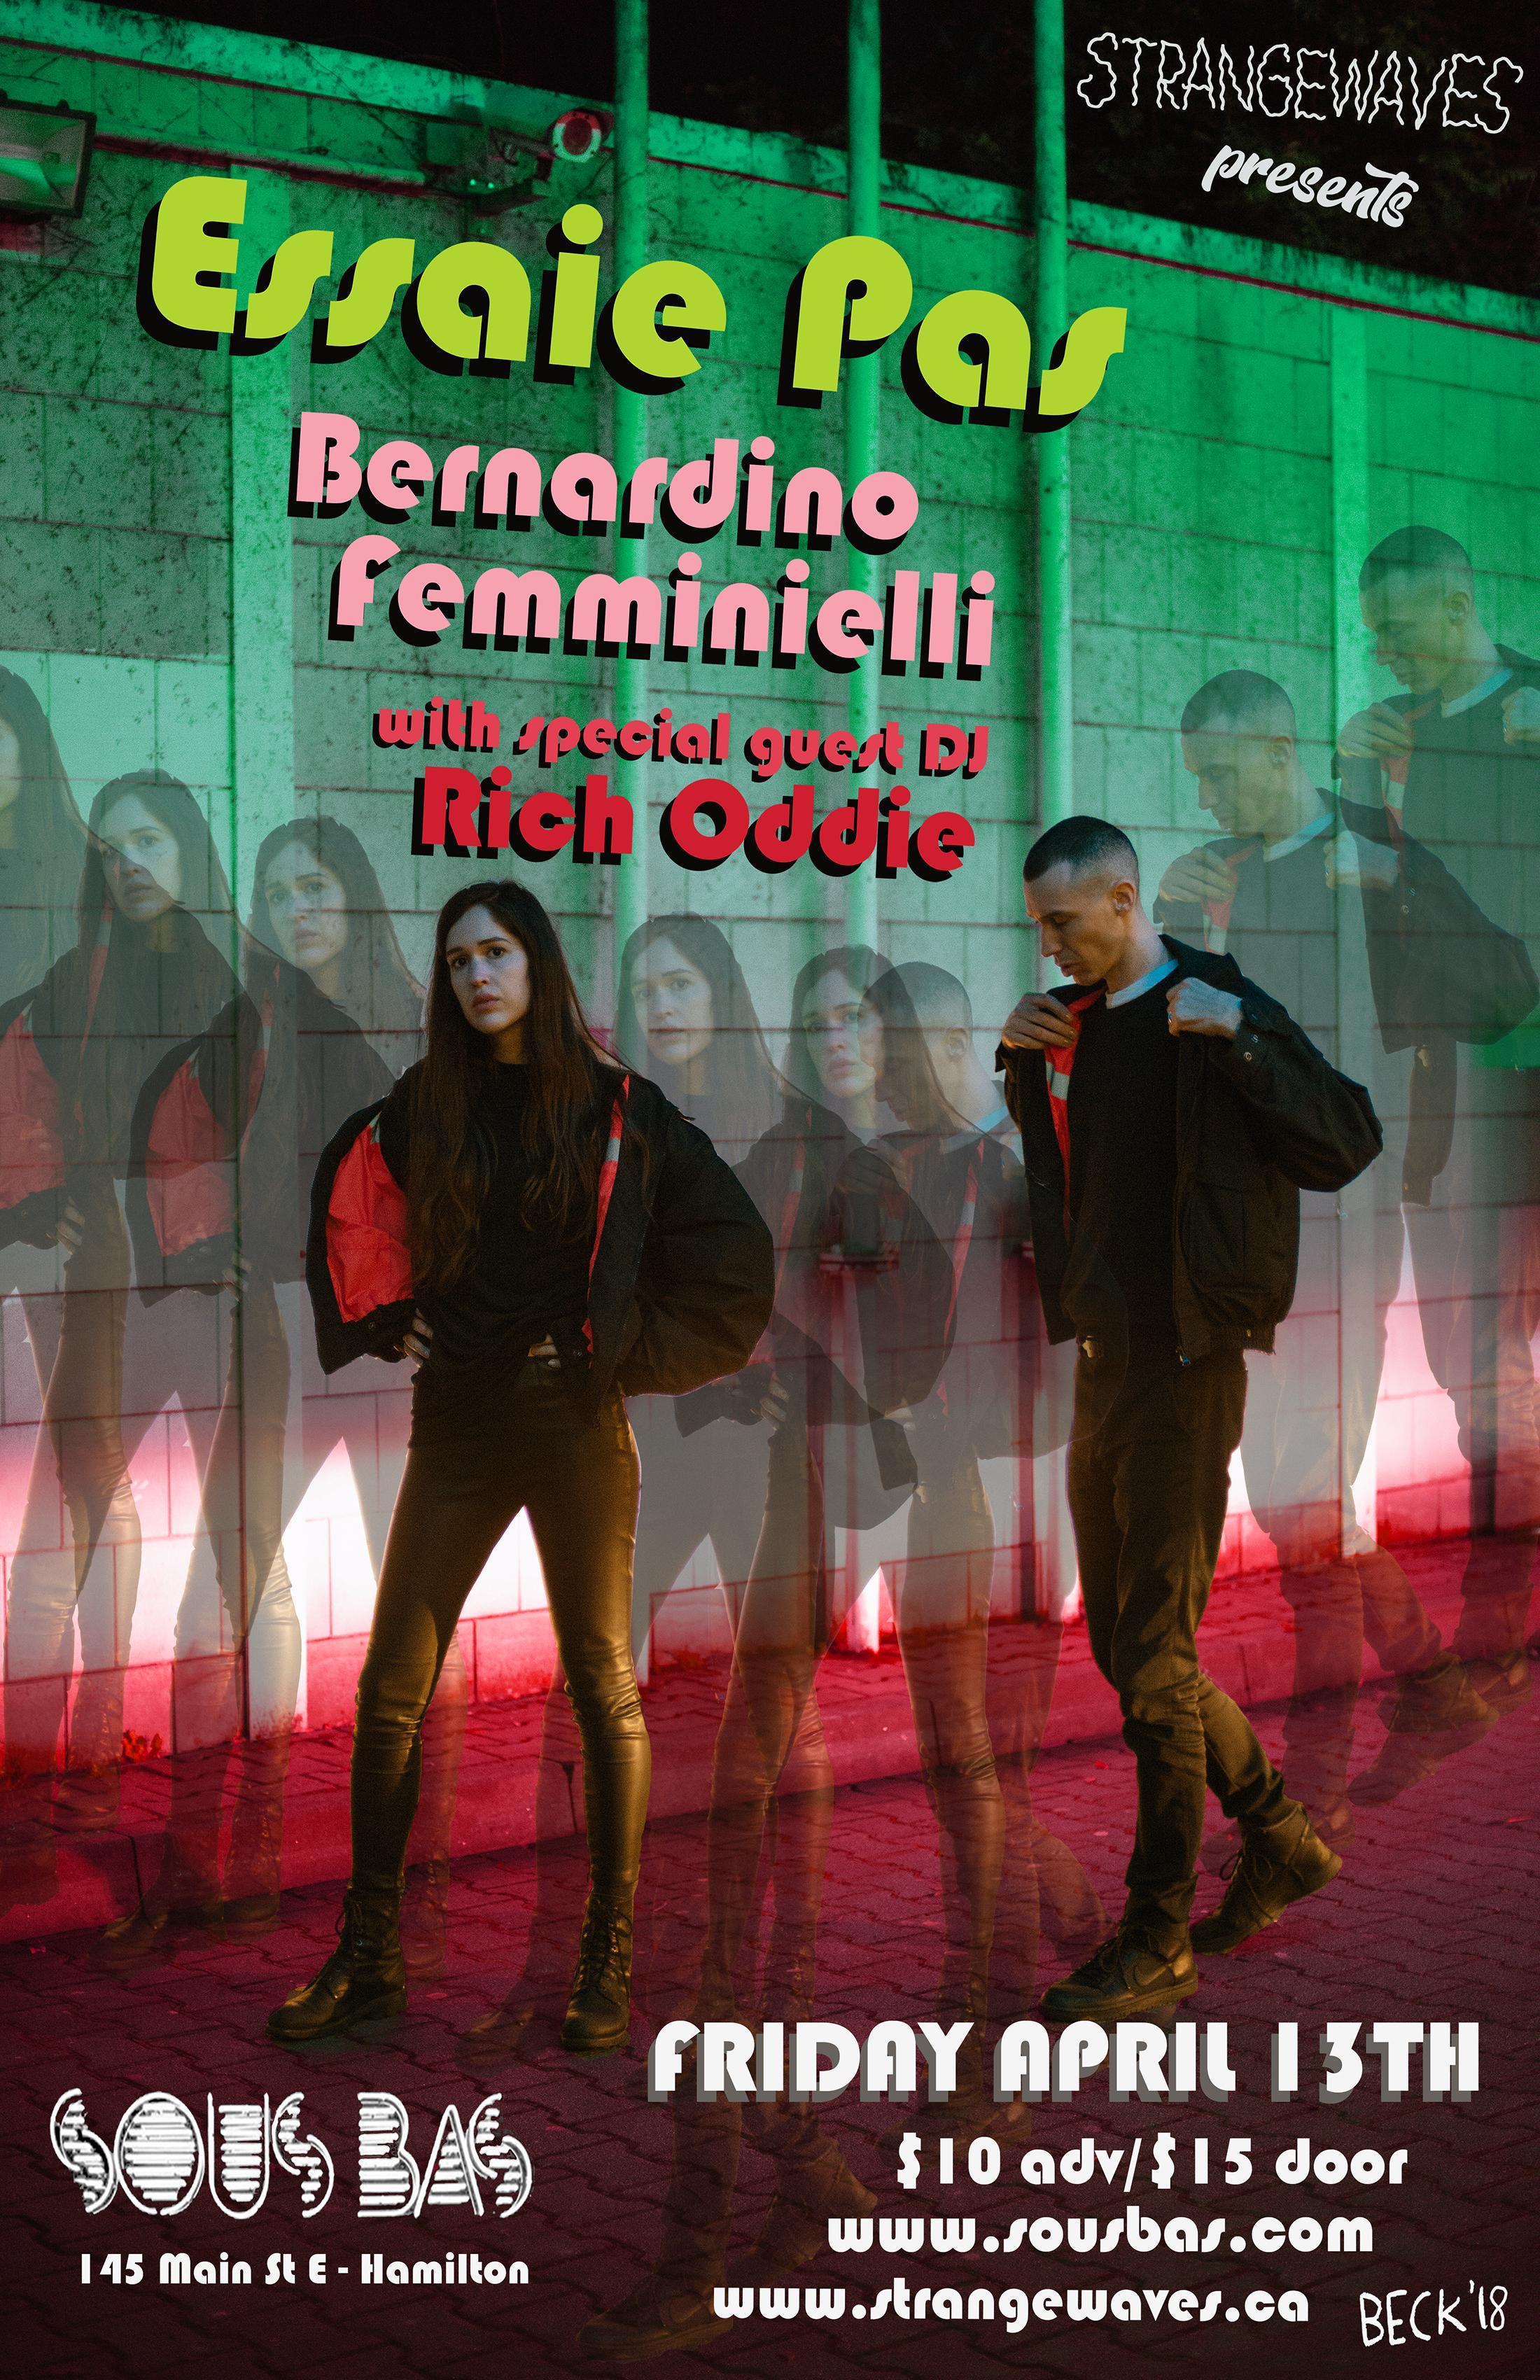 Essaie Pas, Bernardino Femminielli, Rich Oddie  @Sous Bas